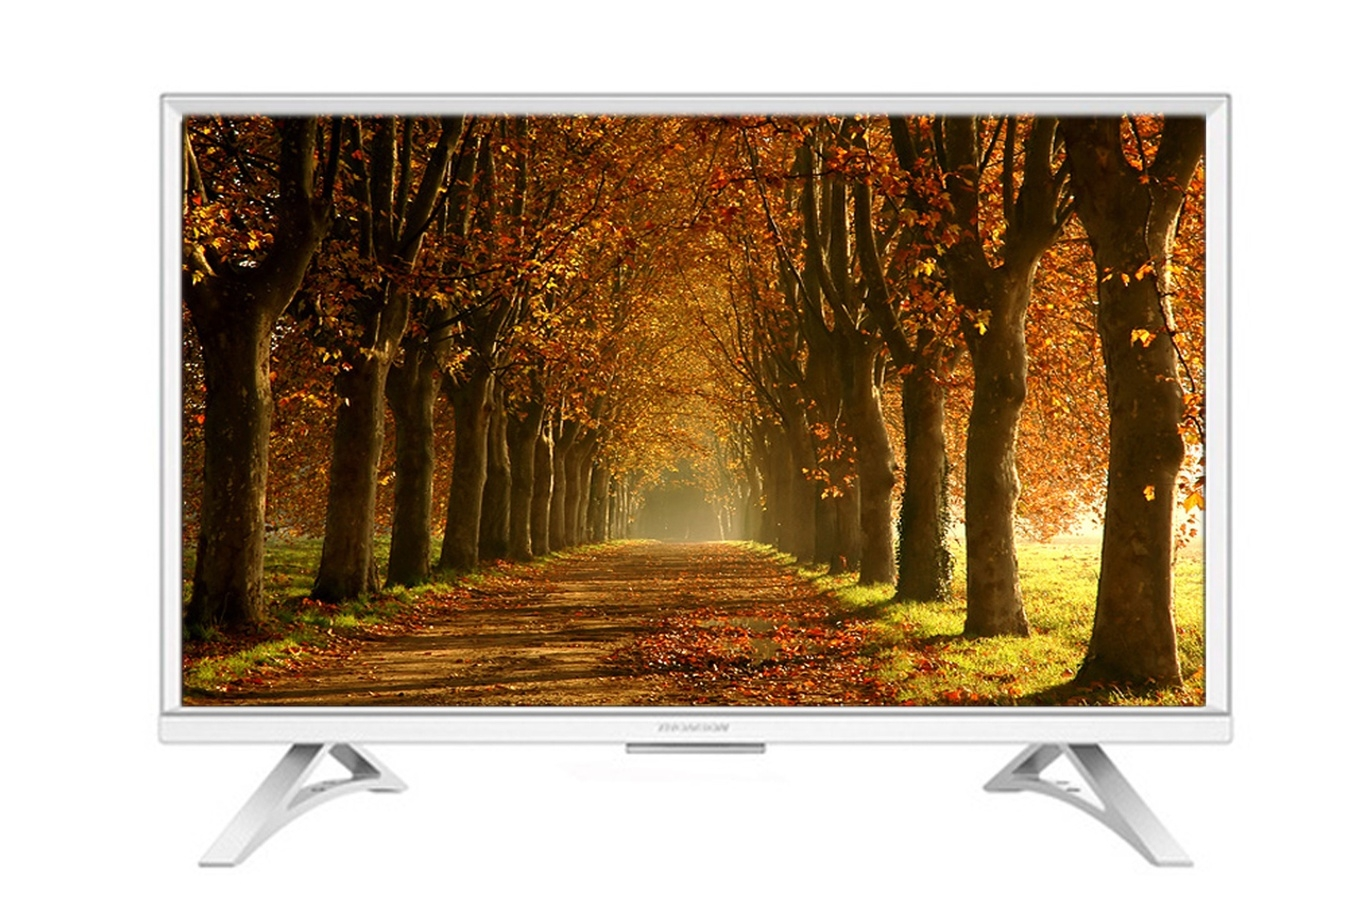 Televizor LED Thomson 28HA3203W, 71 cm, HD, Alb